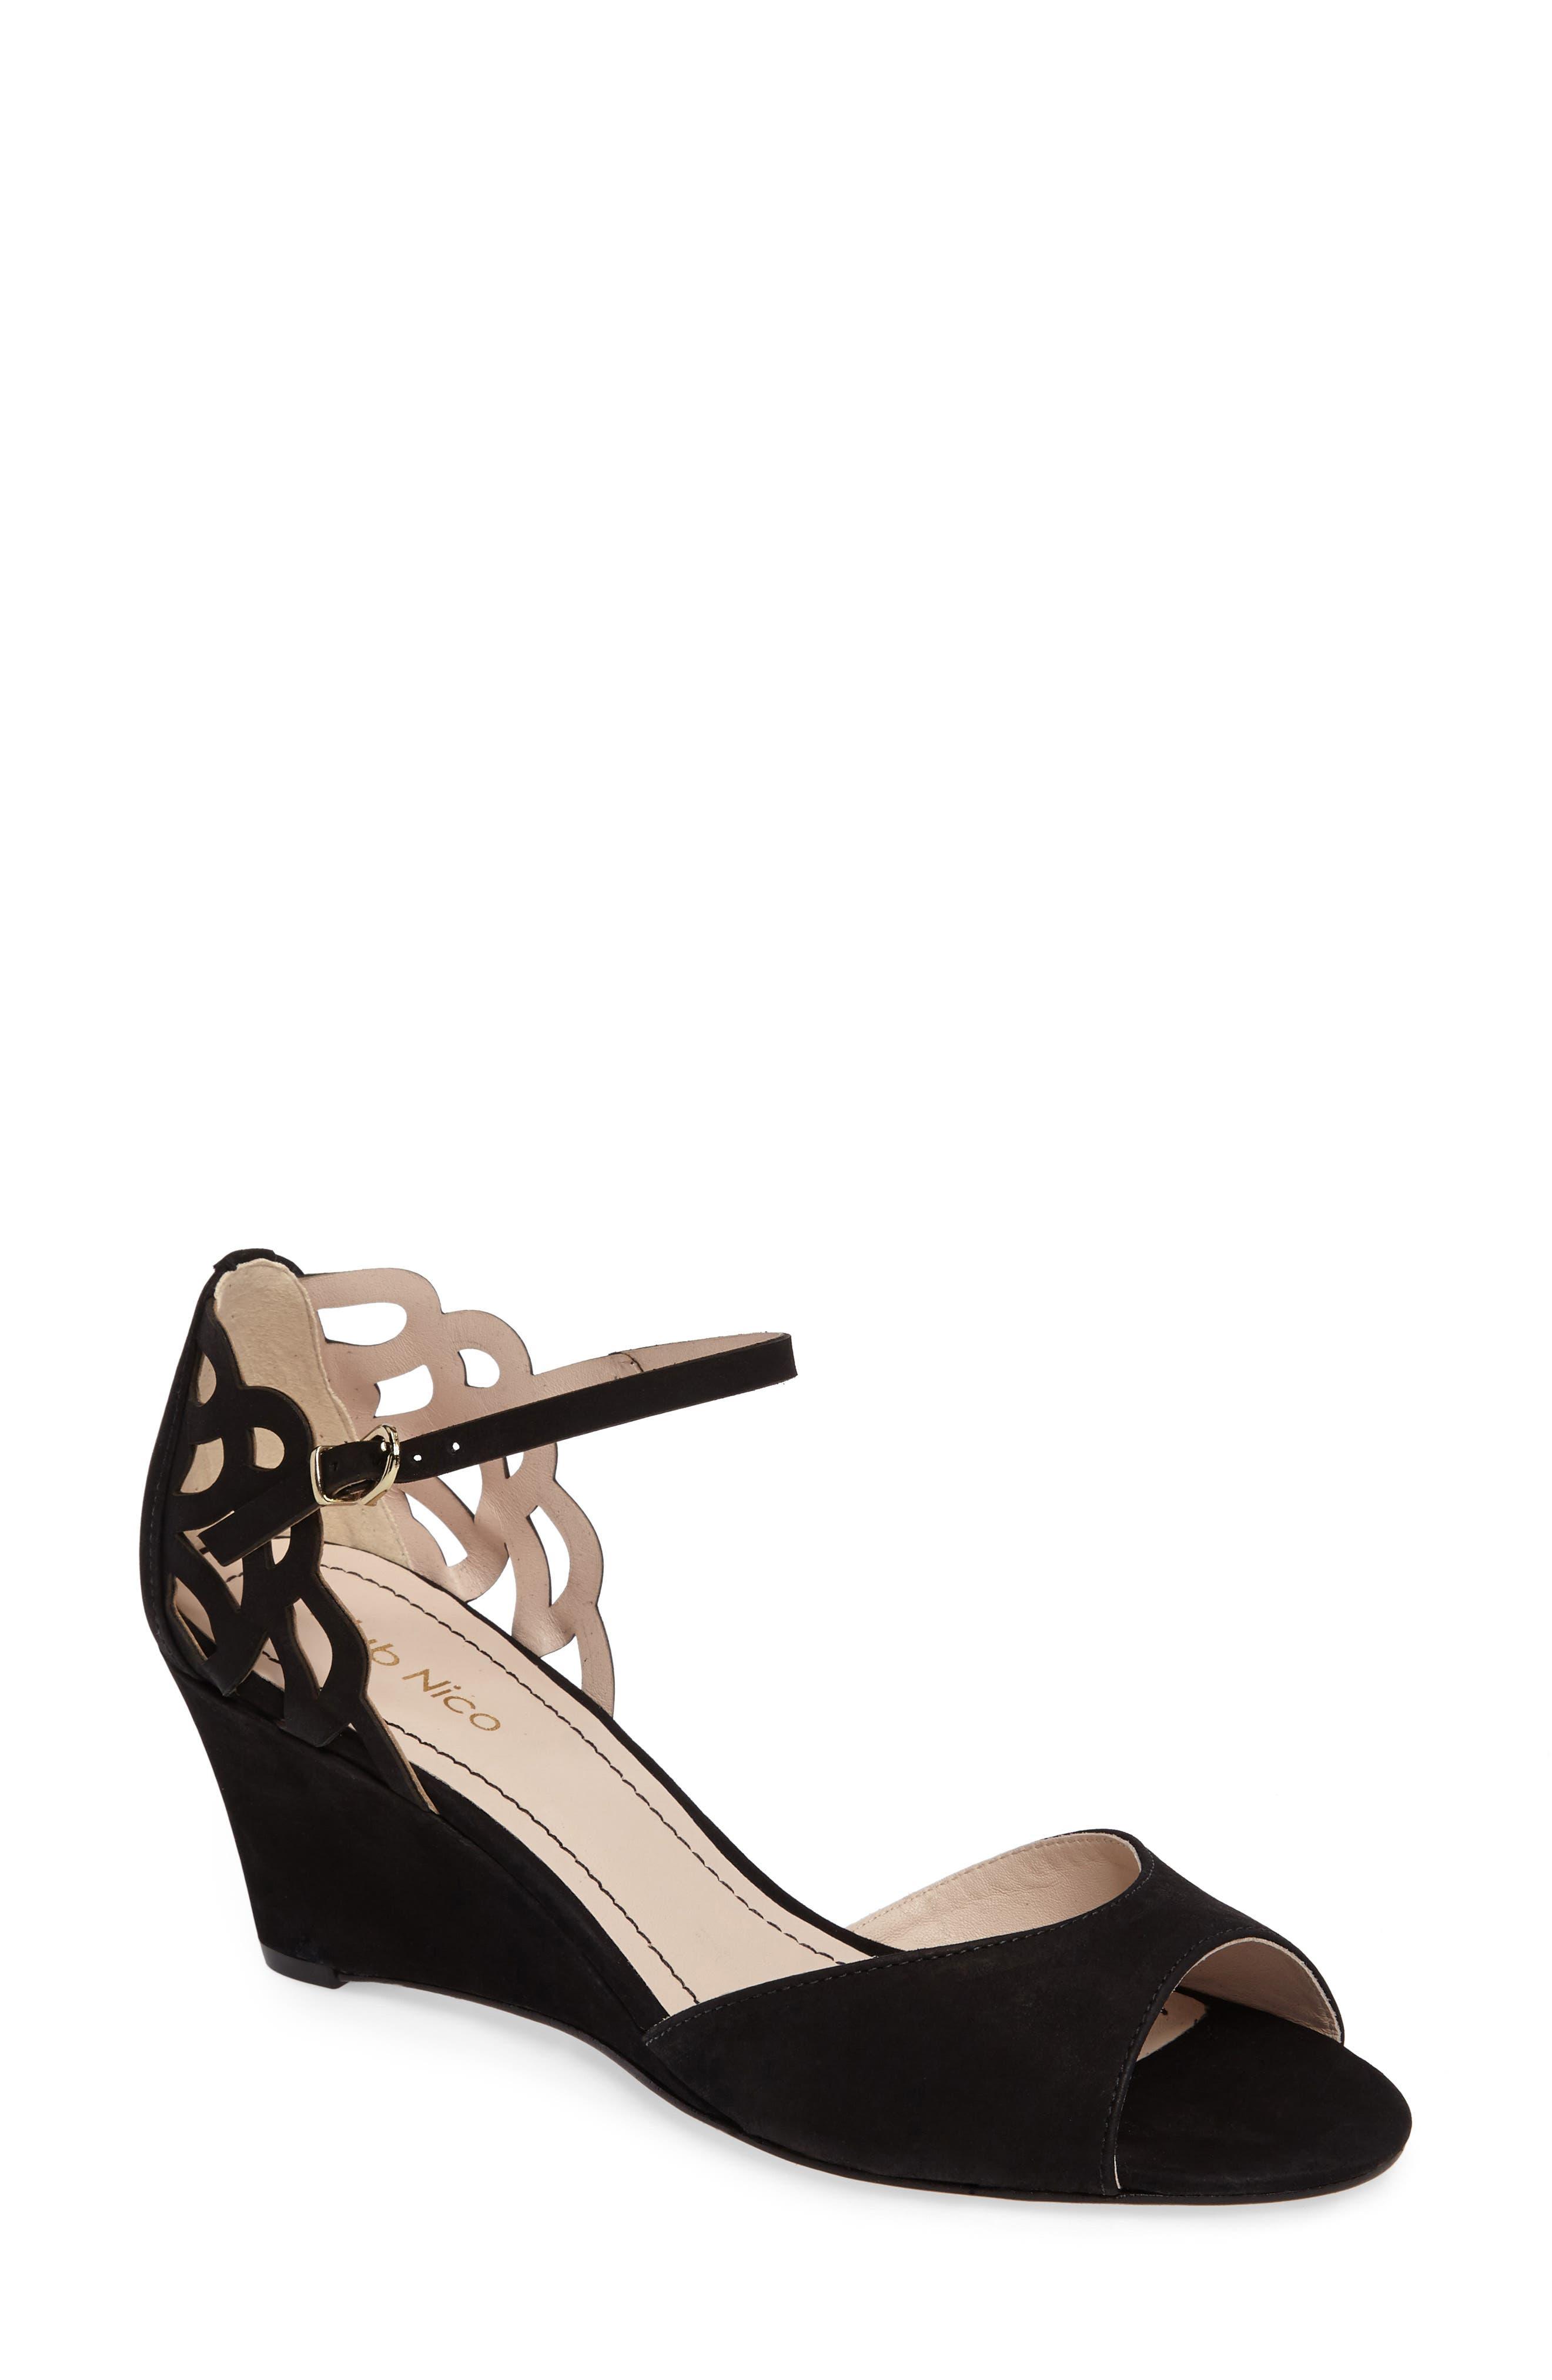 KLUB NICO Karina Cutout Sandal, Main, color, BLACK NUBUCK LEATHER